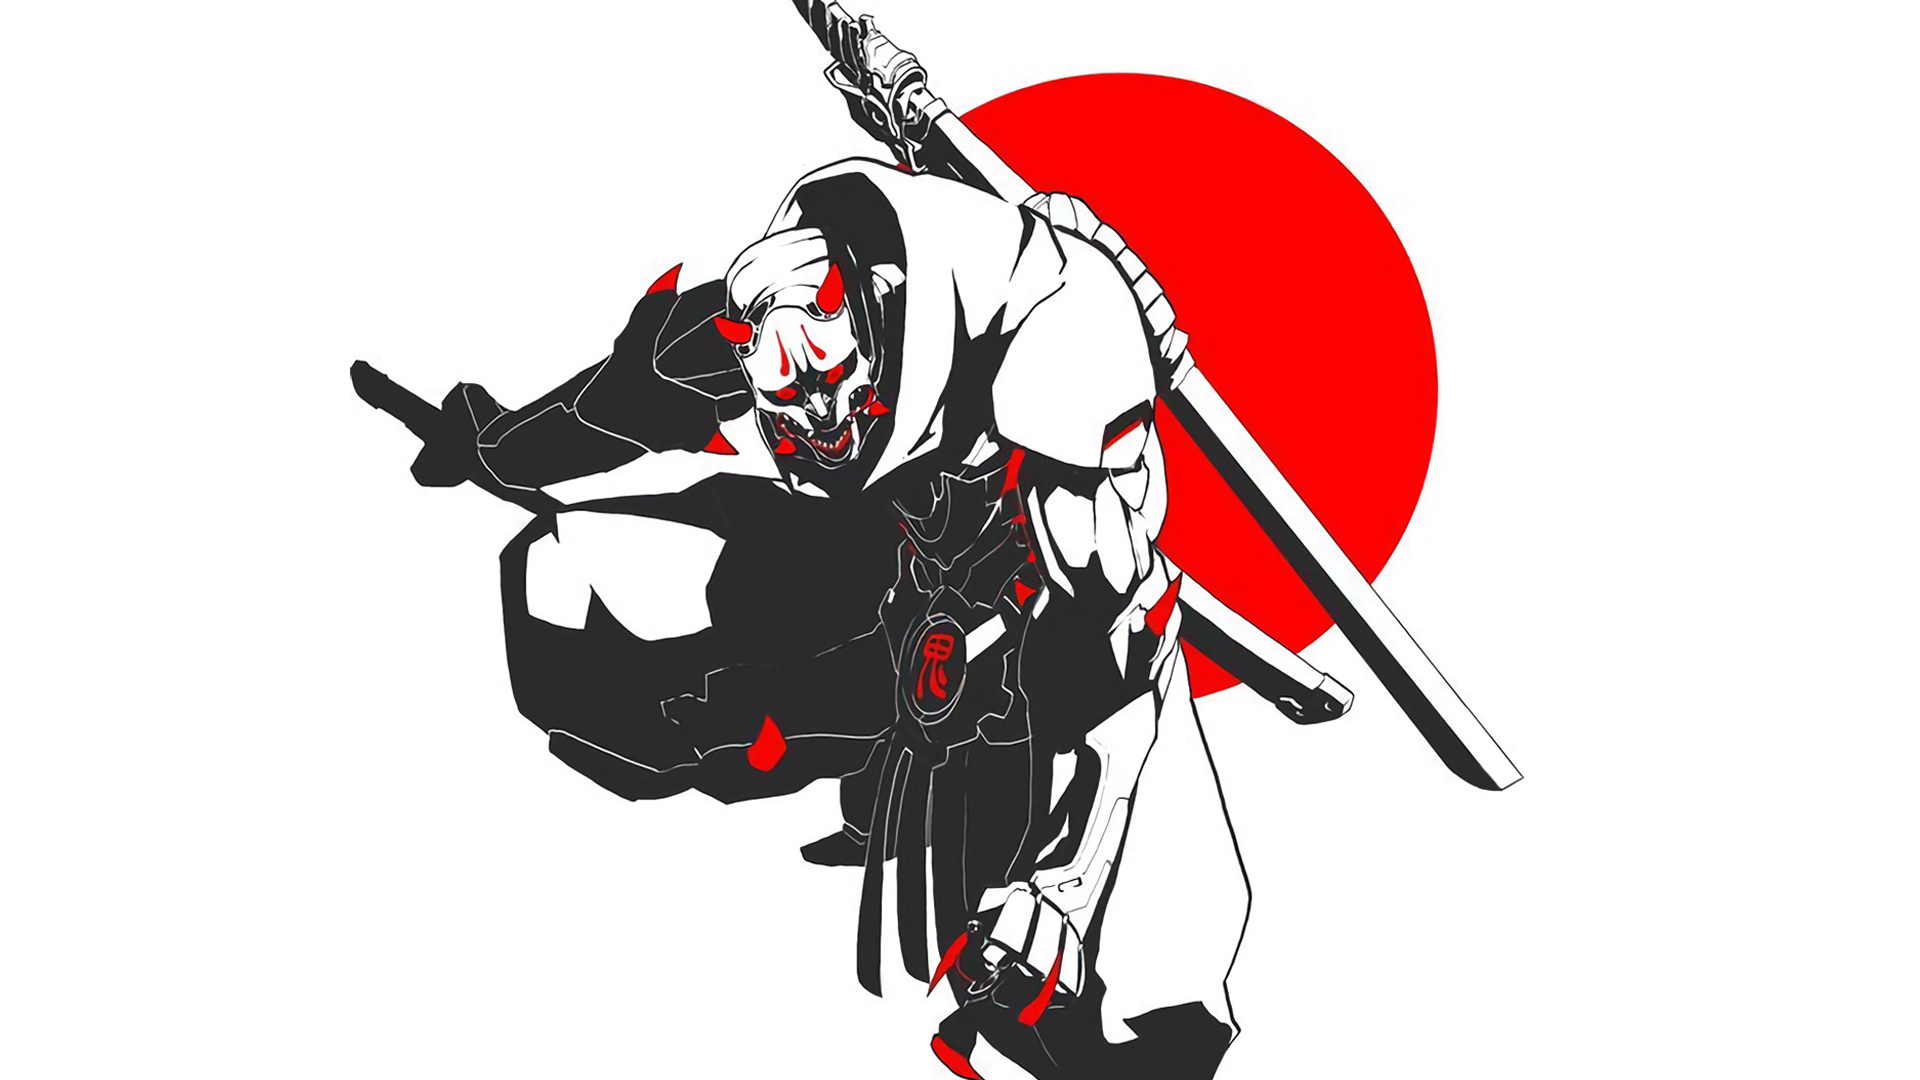 Anime Manga Japan Samurai Ninja Katana Oni Simple Background Shinobi Oni Mask Genji Overwatch Wallpaper Resolution 1920x1080 Id 695068 Wallha Com